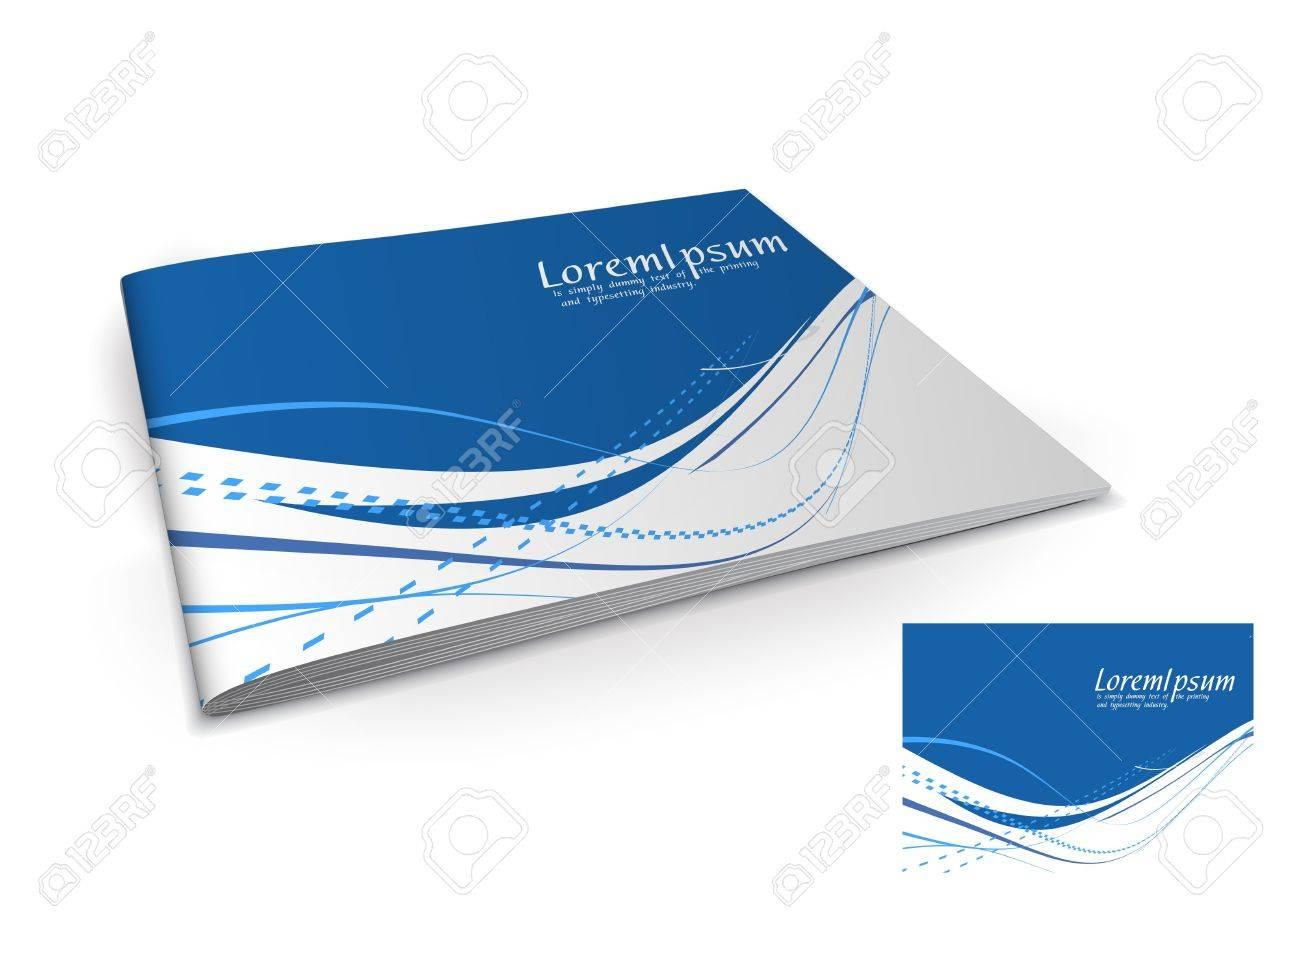 Presentation of brochure cover design template., vector illustartion. Stock Vector - 9610805